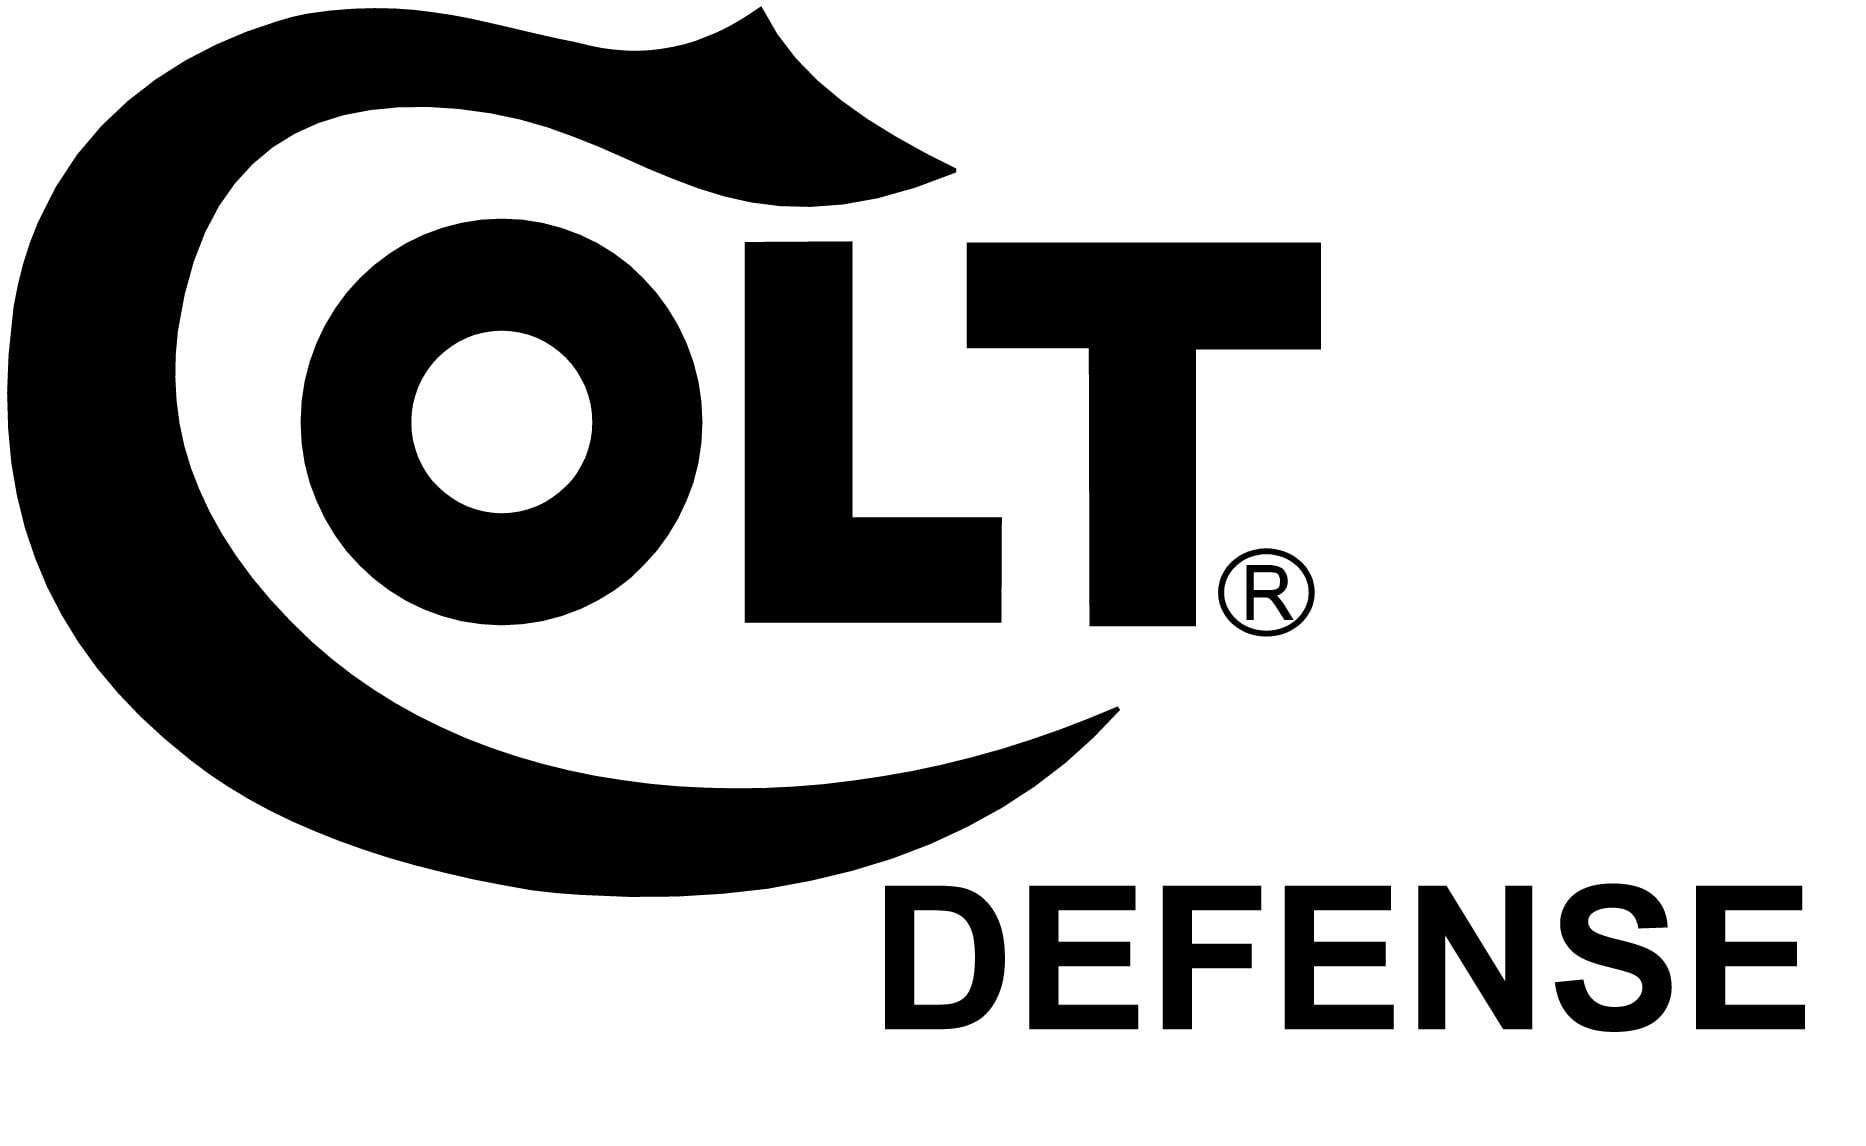 Colt Logo - Bristlecone Shooting Range, Firearms Training & Retail Center Denver, CO